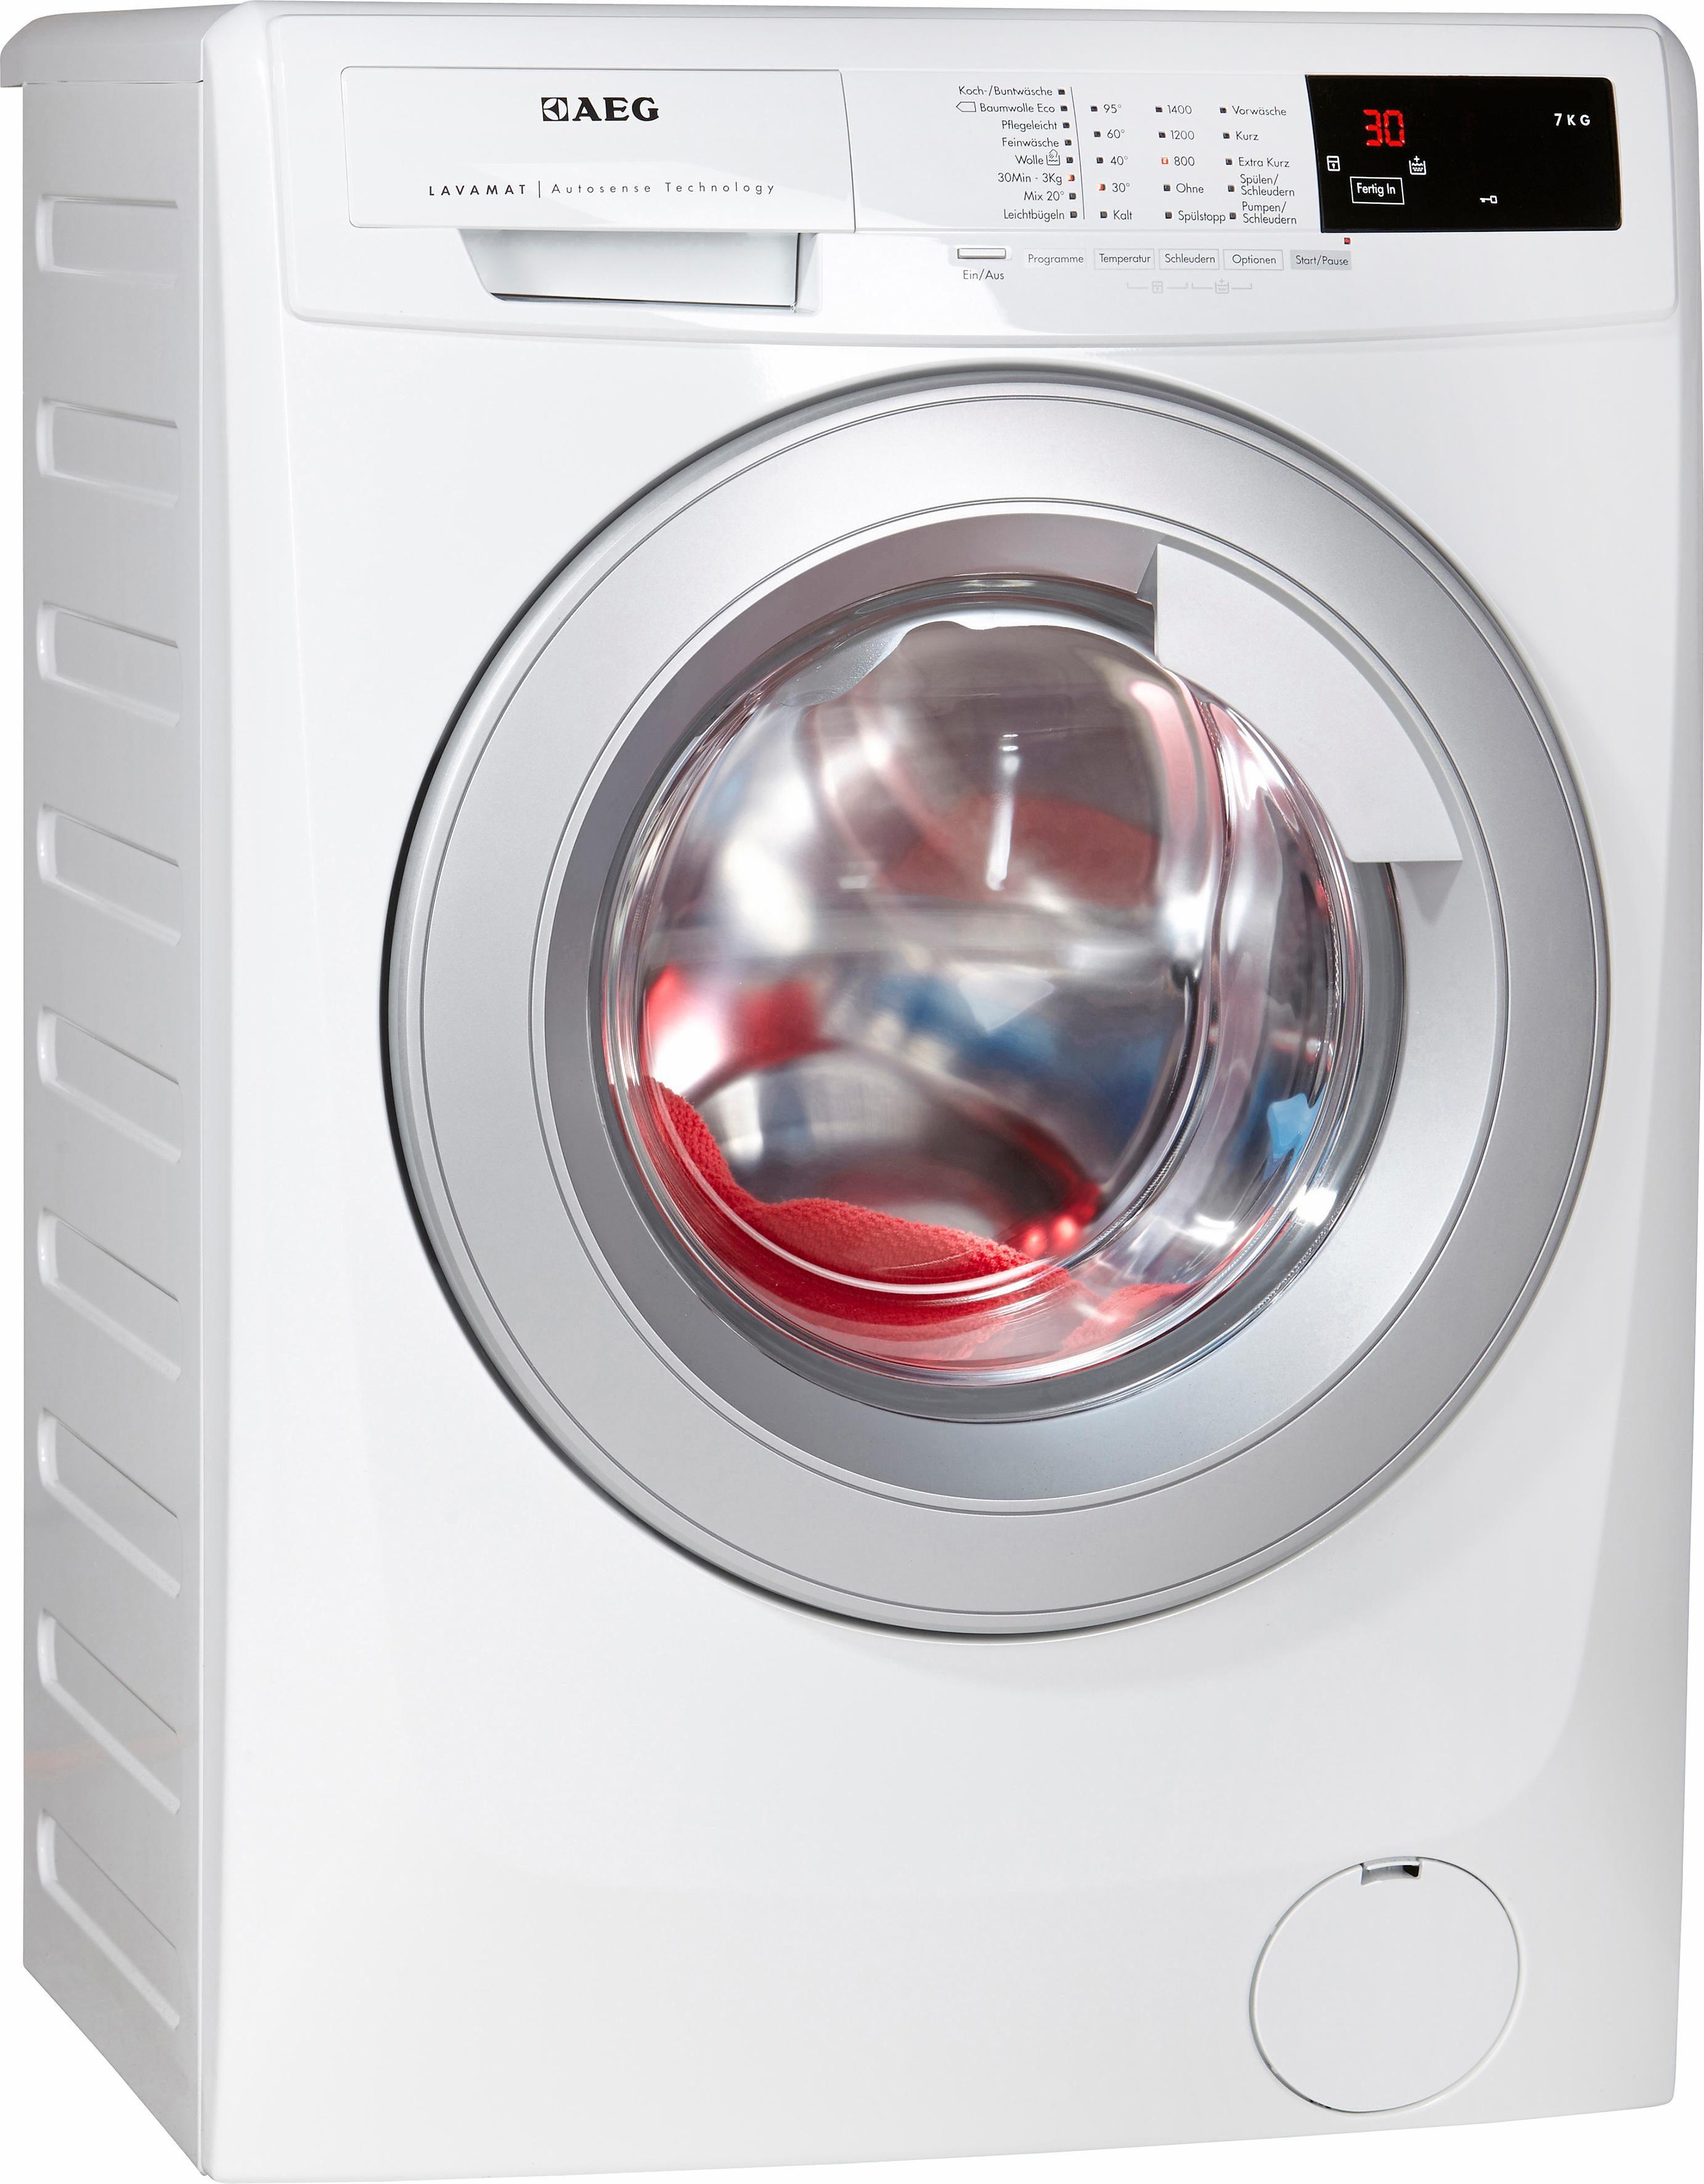 AEG Waschmaschine Lavamat L68470VFL, A+++, 7 kg, 1400 U/Min